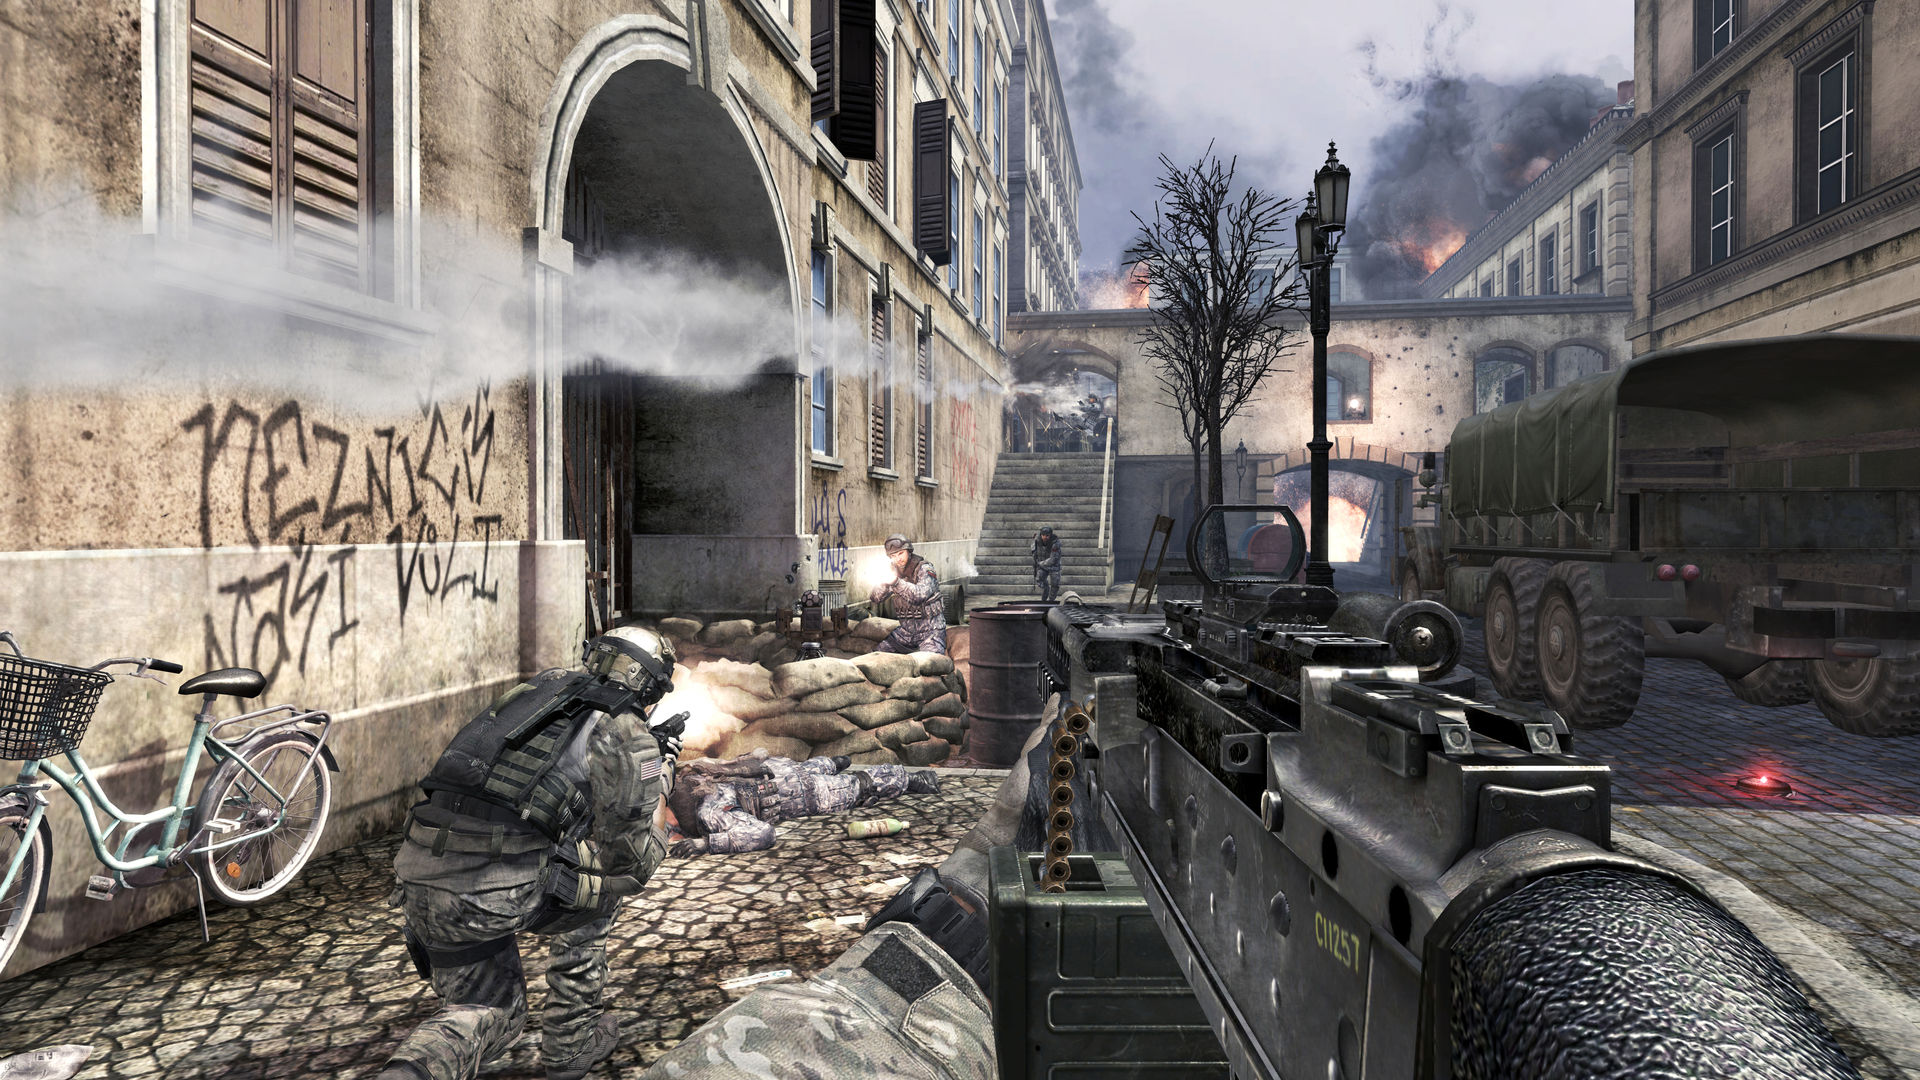 Call Of Duty Modern Warfare 3 On Steam